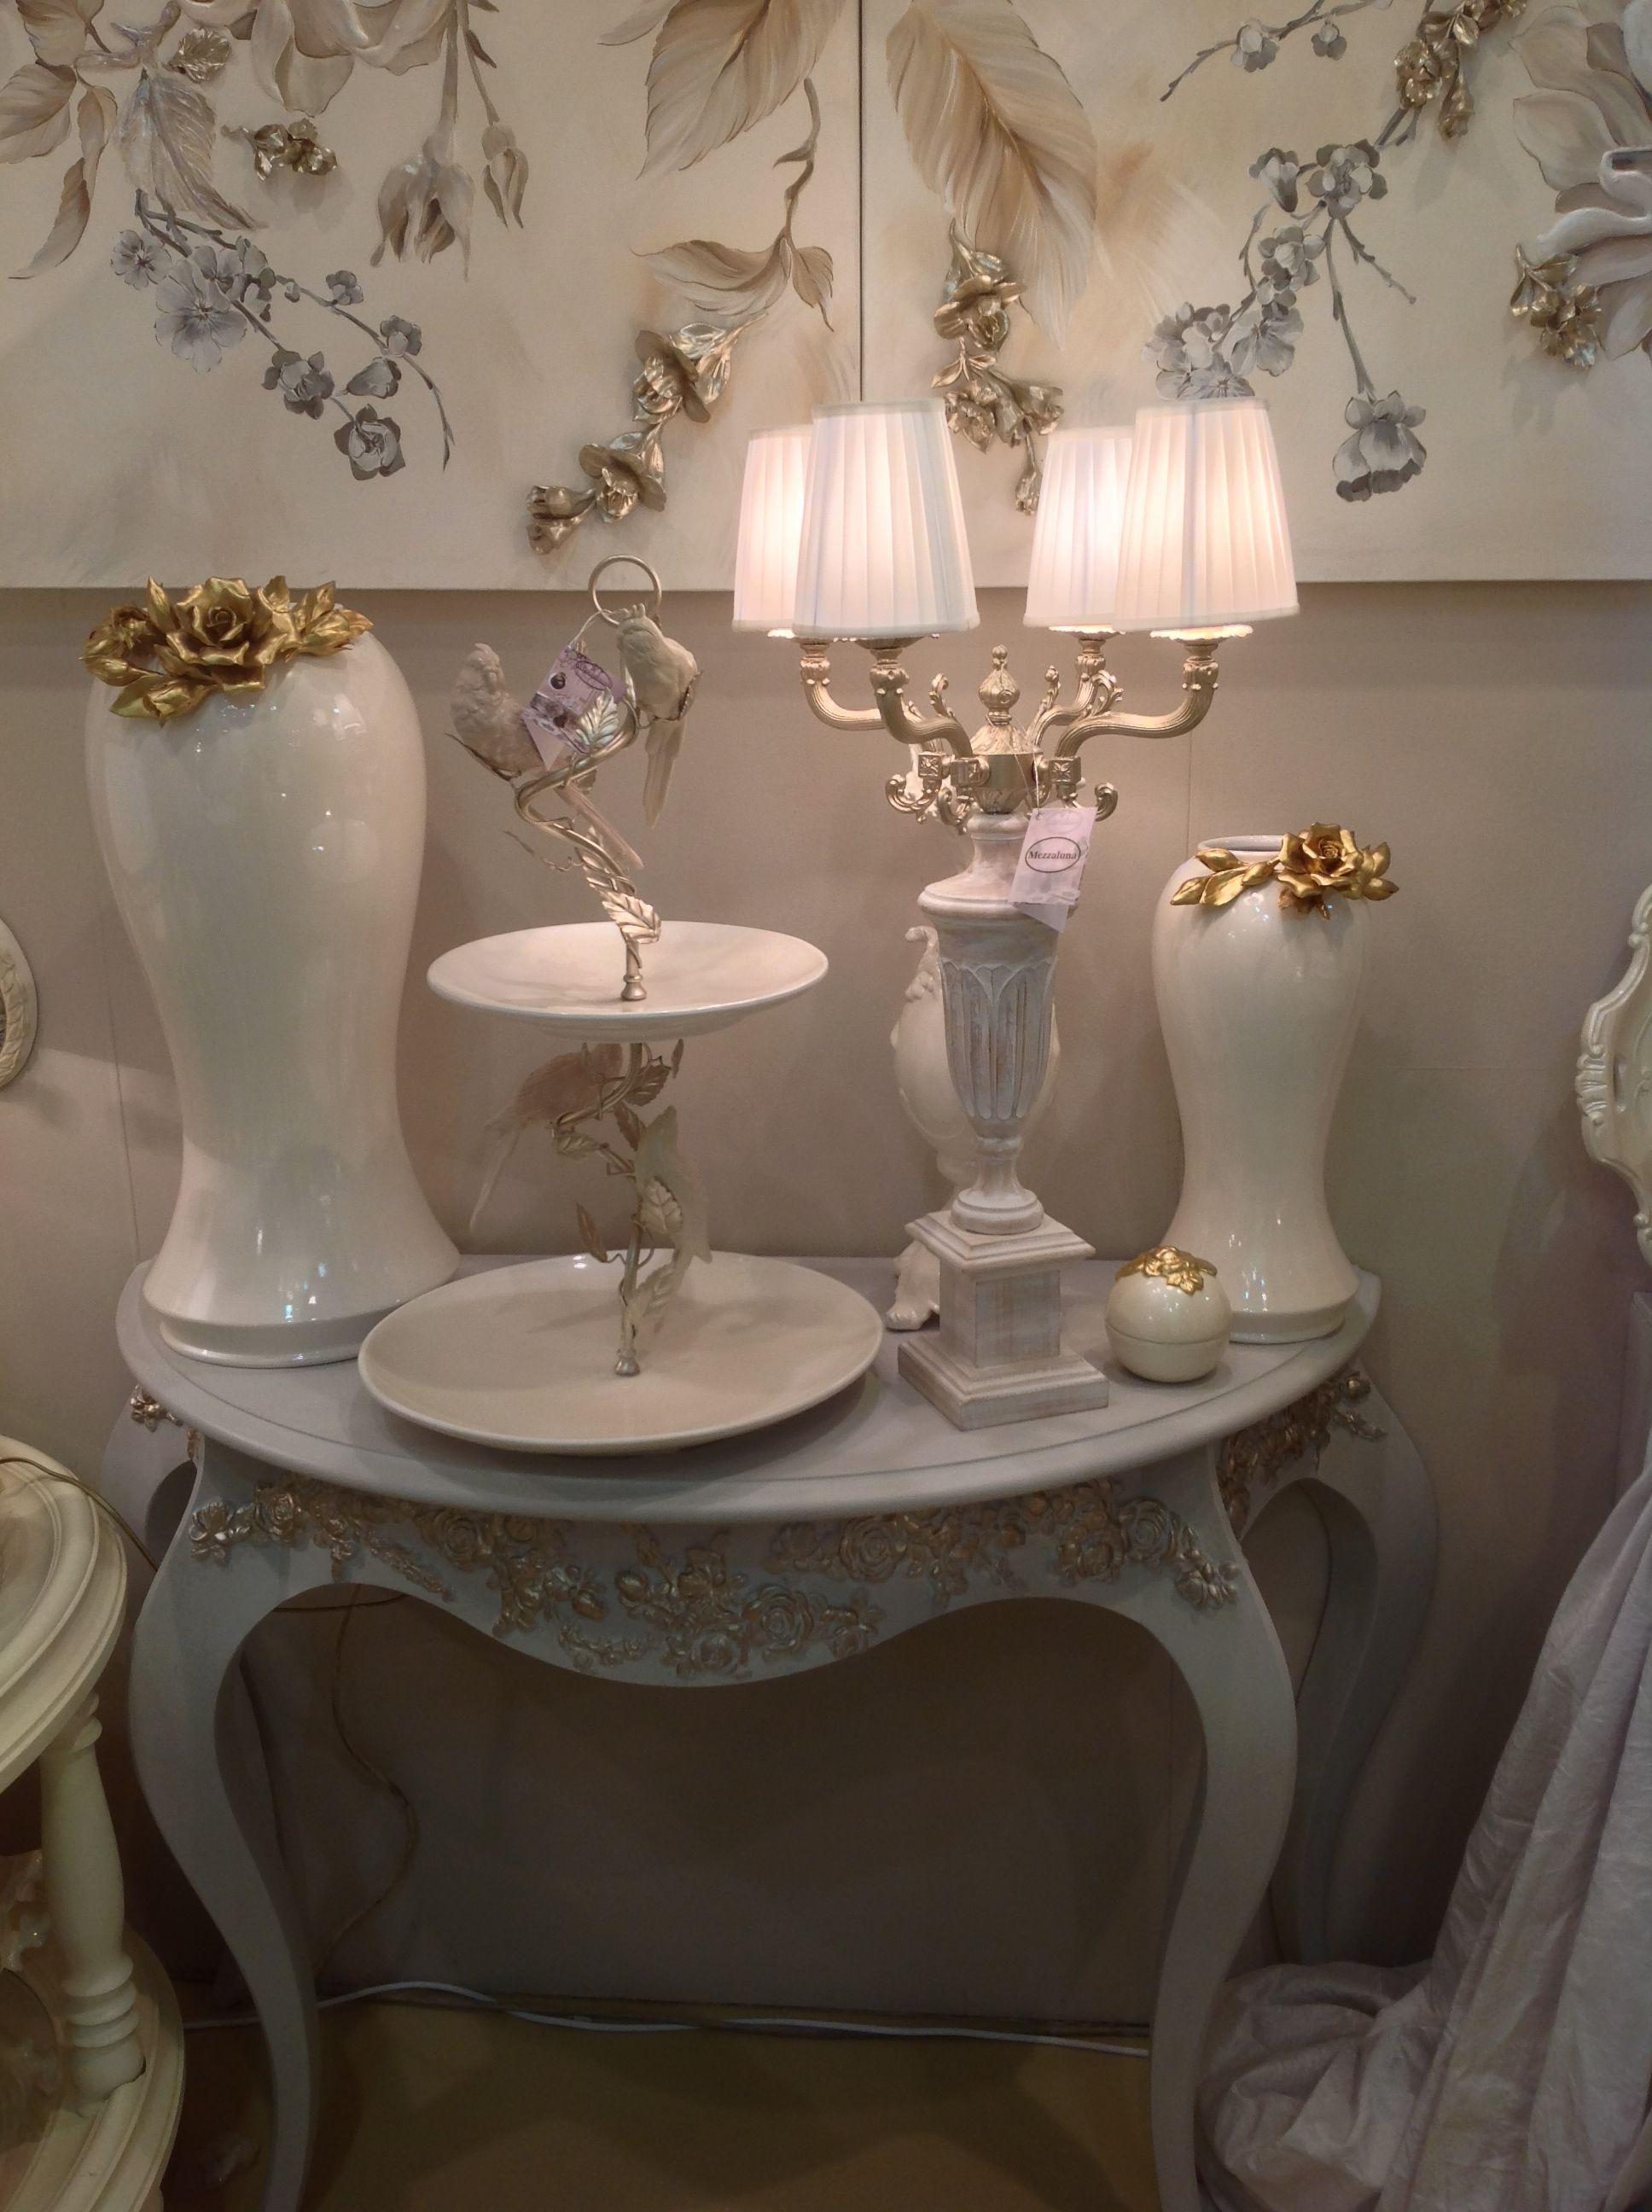 #Lampada #vaso #etagere #tavolo #pannelli #decorativi HOMI Milano 2015